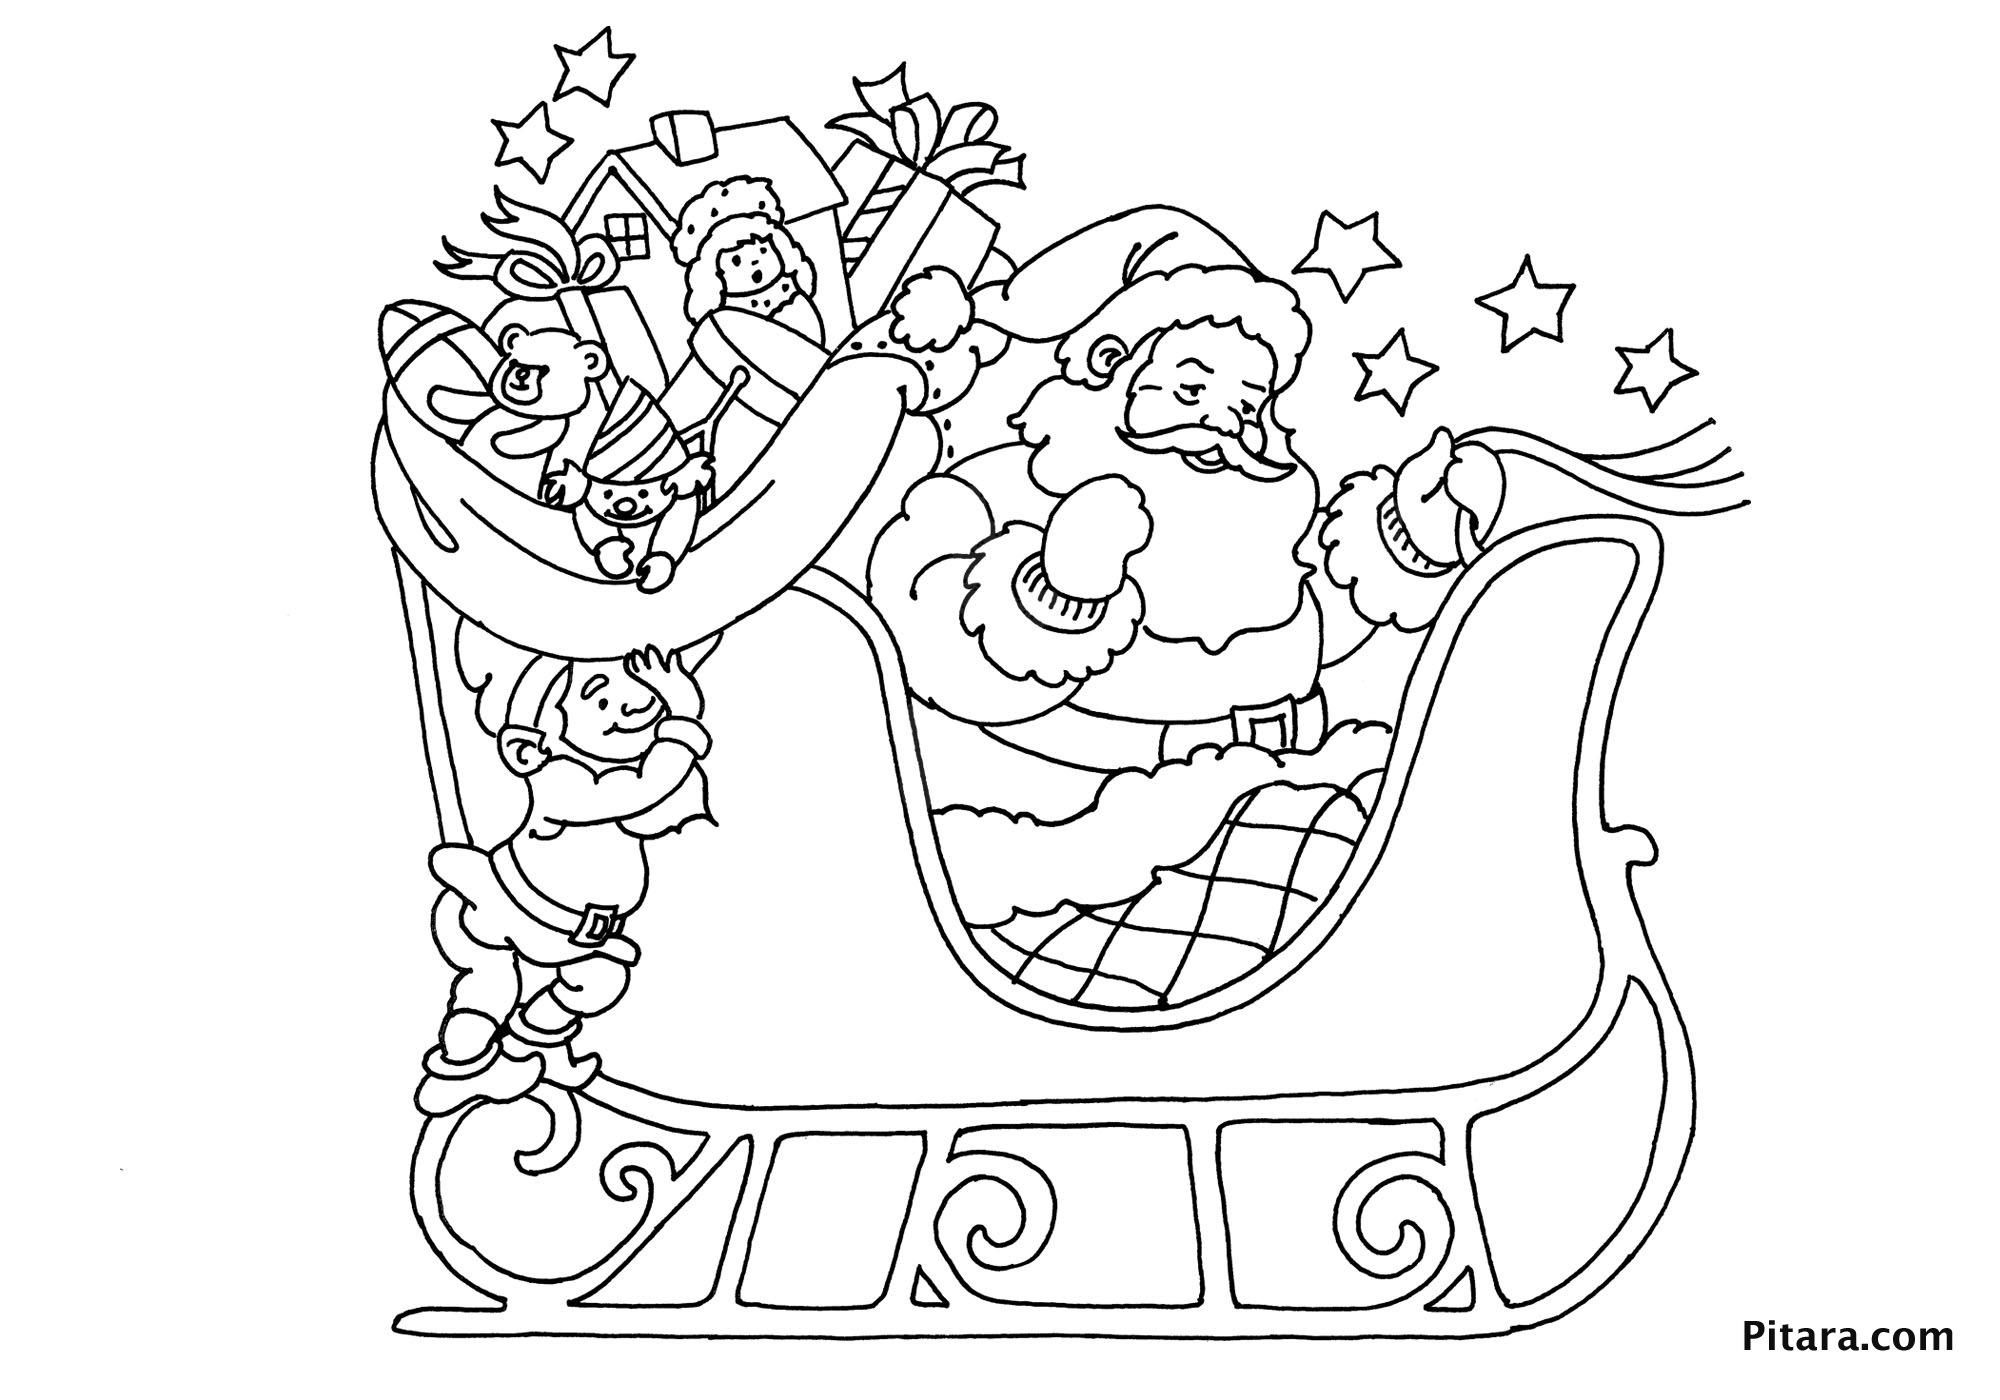 Santa Claus On Sleigh Pitara Kids Network